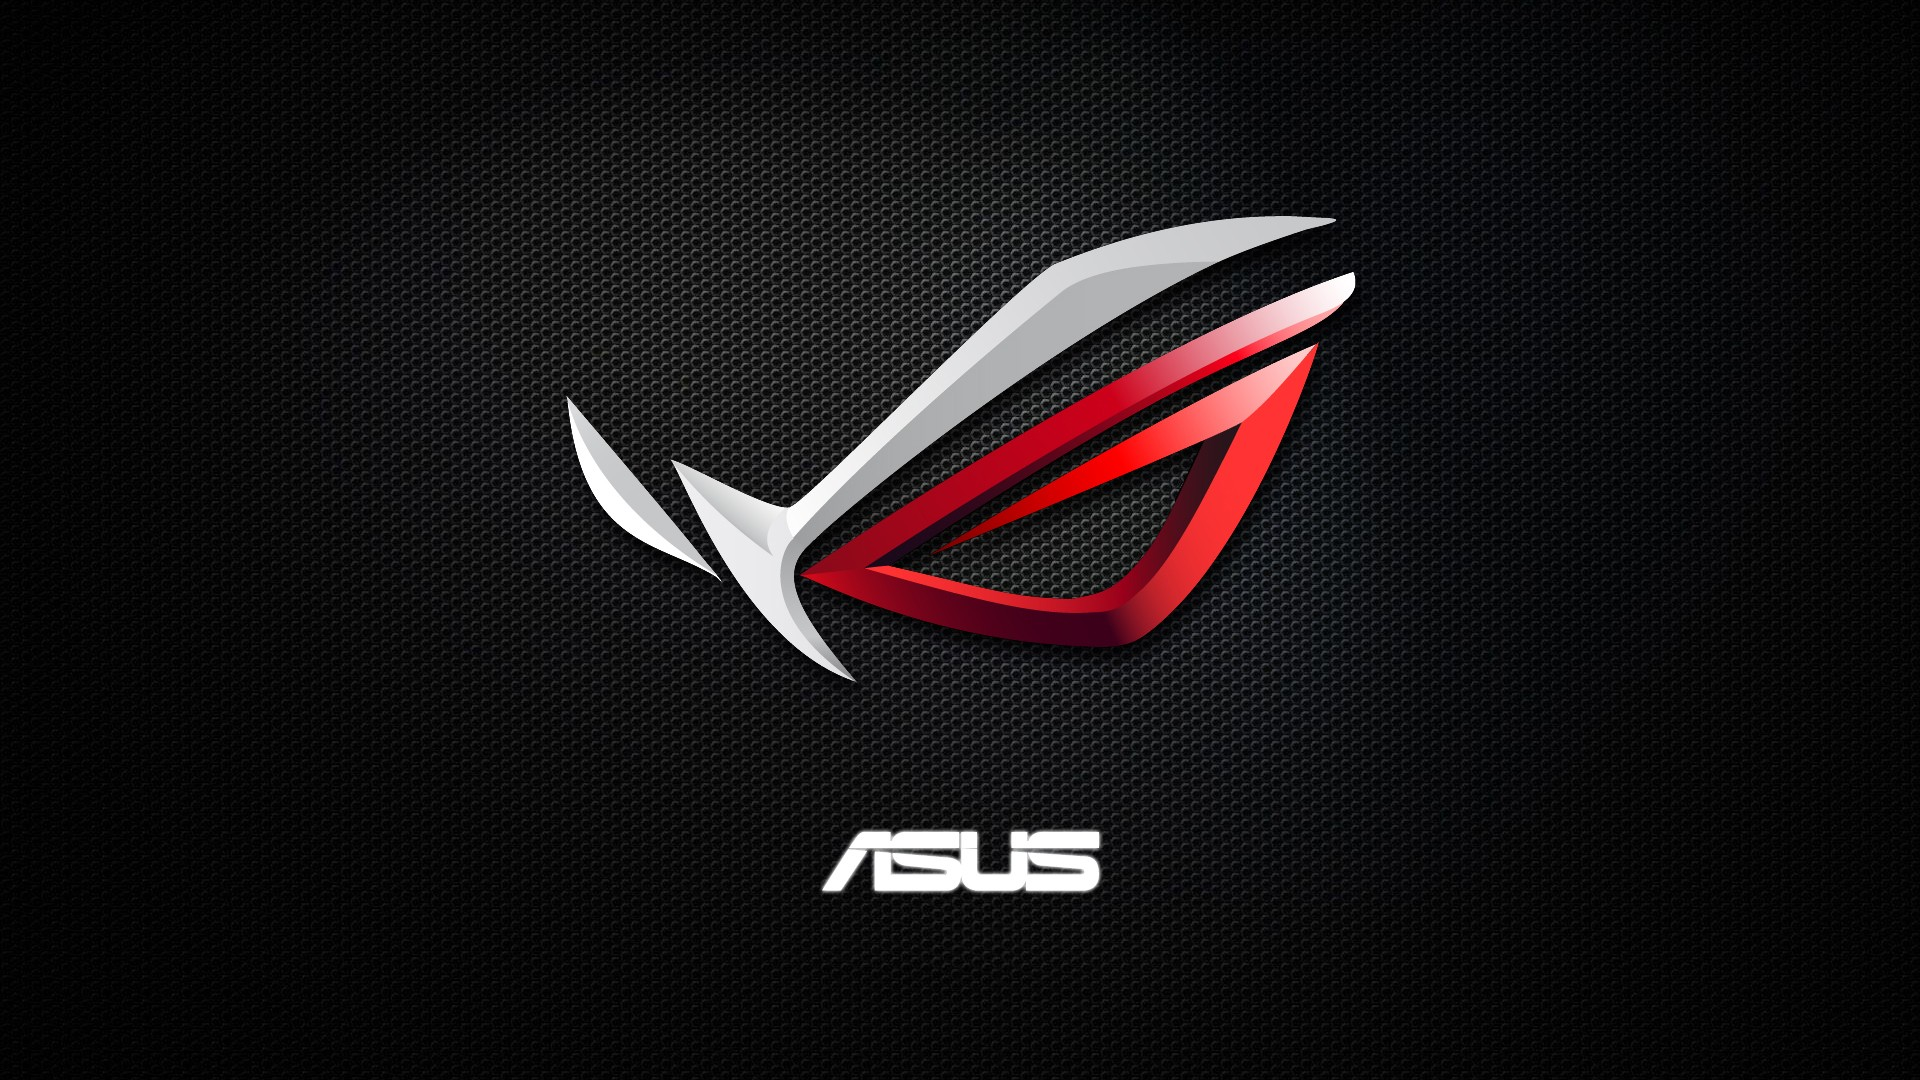 Download Asus Logos Wallpaper 1920x1080 Wallpoper 364125 1920x1080